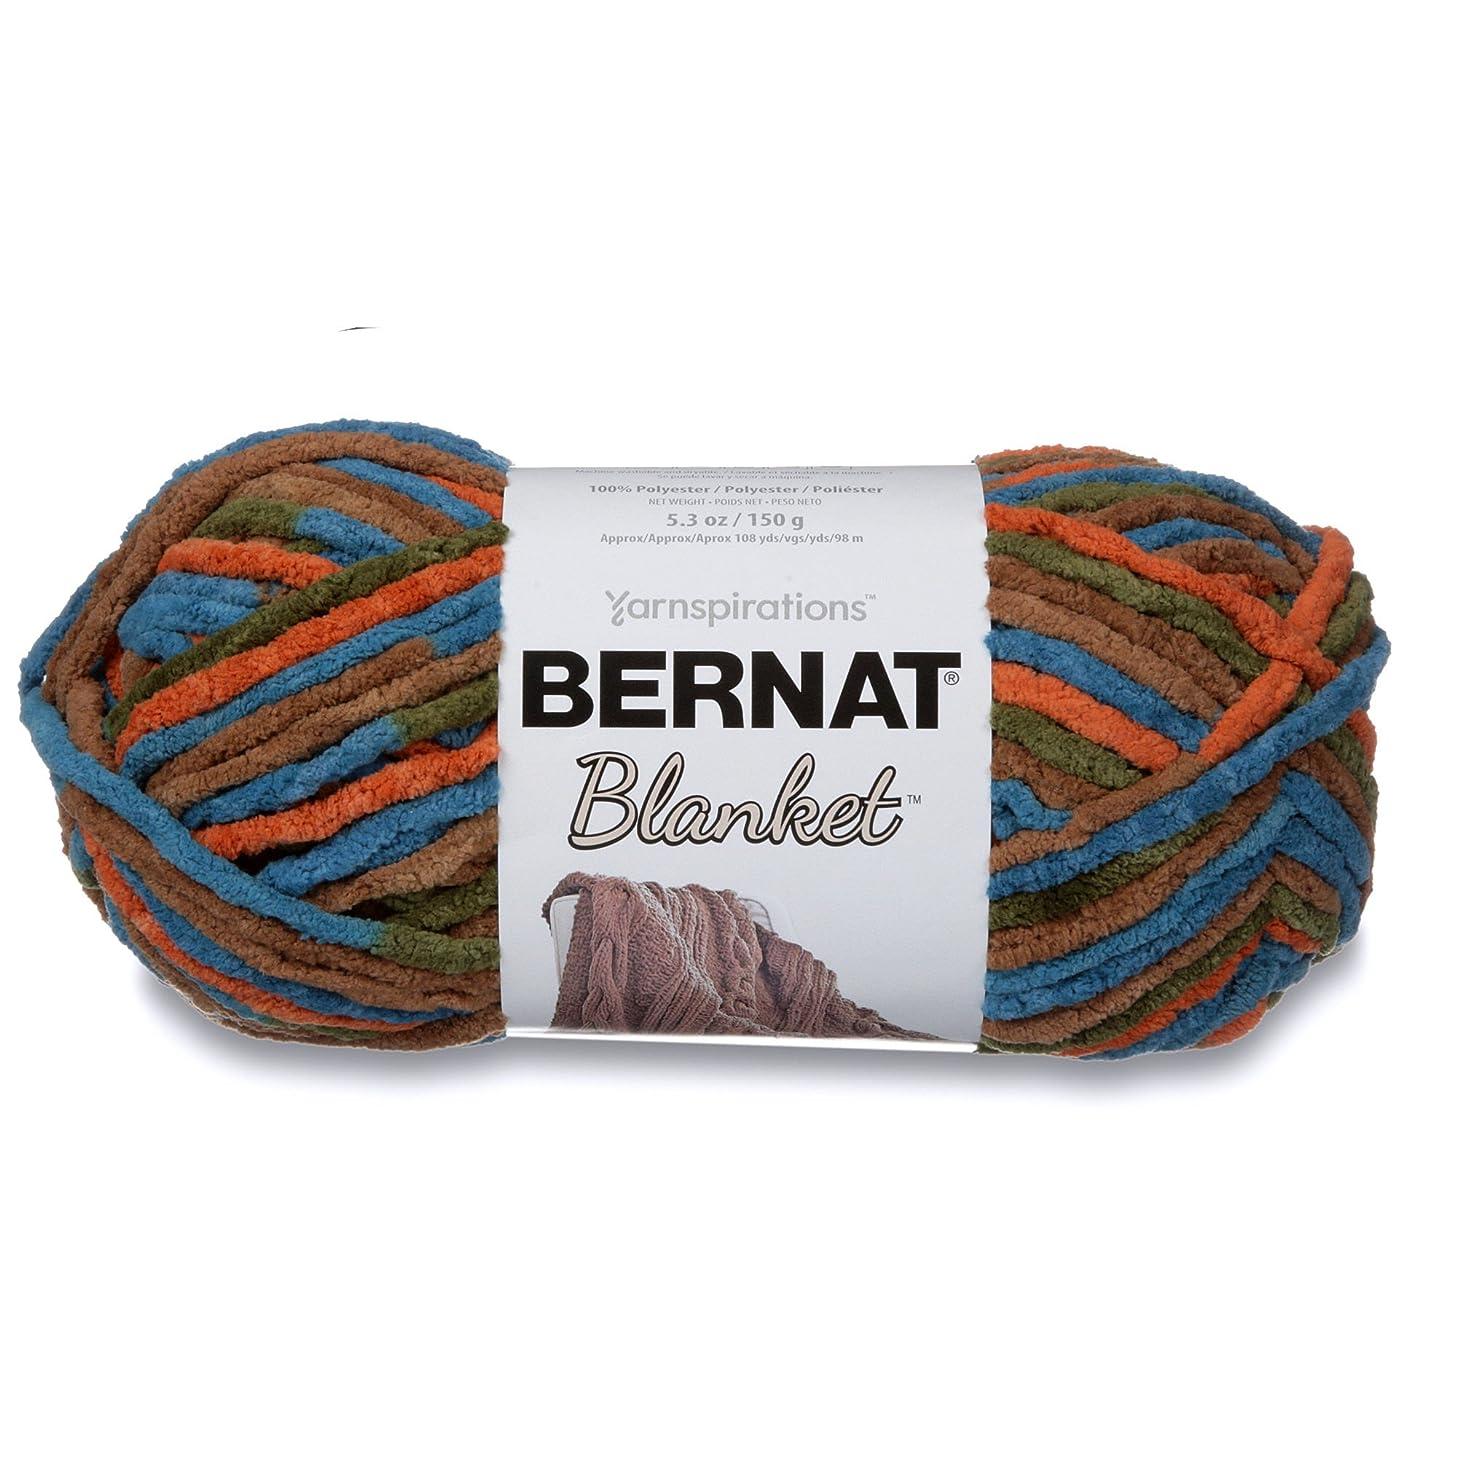 Bernat Blanket Super Bulky Yarn, 5.3oz, Guage 6 Super Bulky, Cozy Cabin